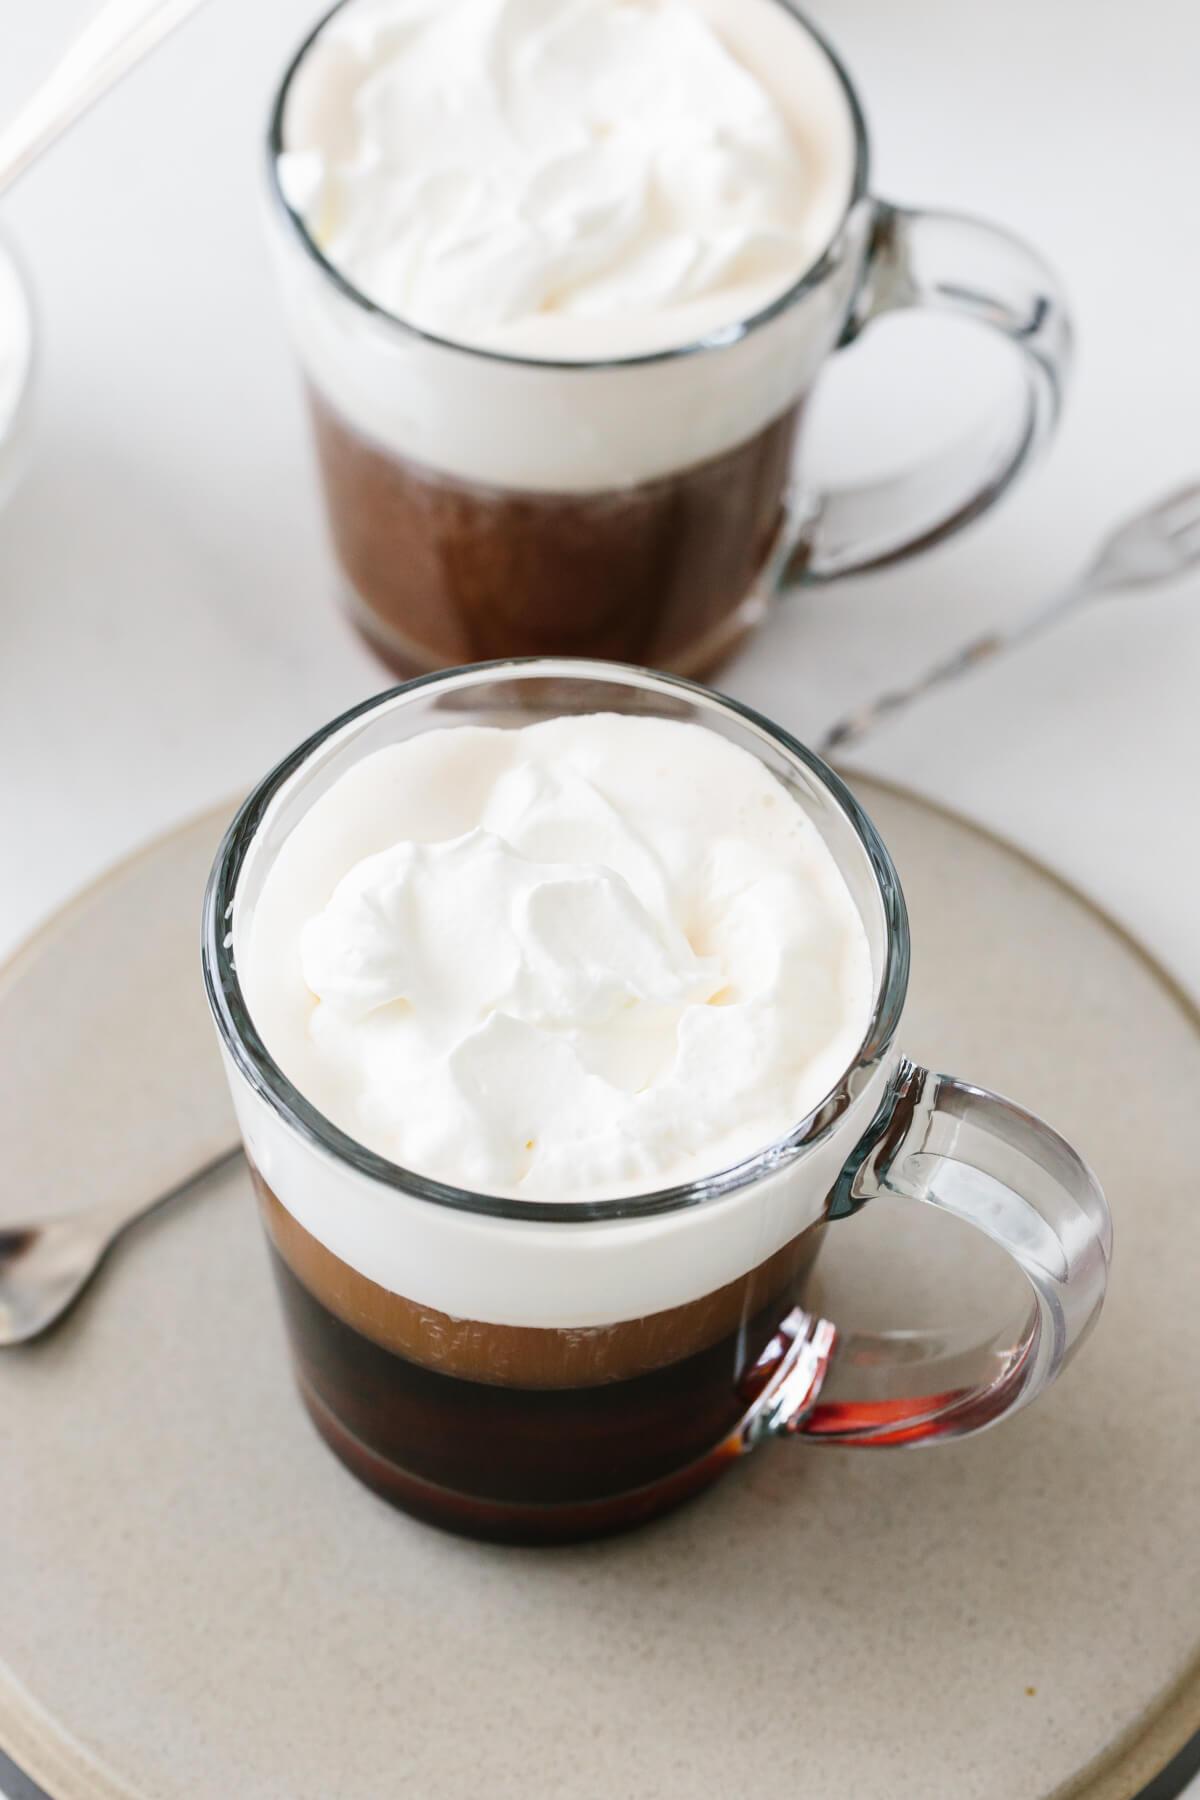 Two glasses of Irish Coffee.